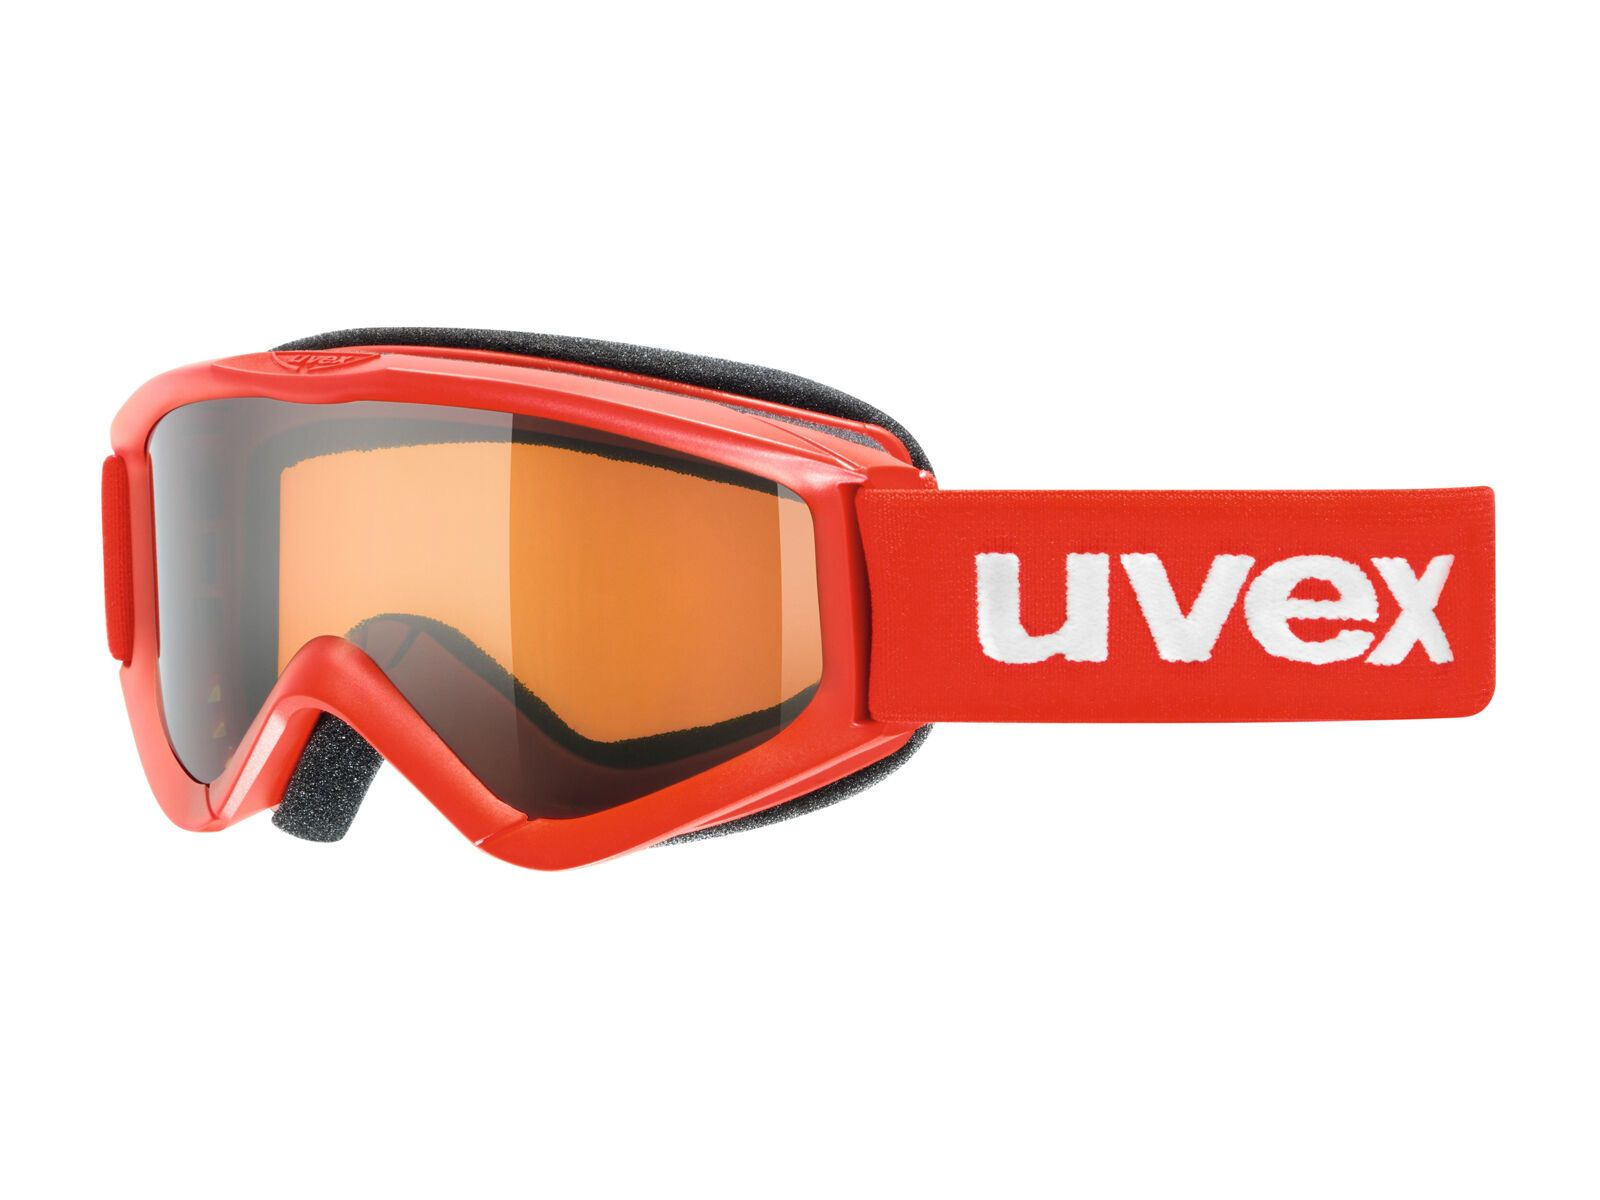 uvex speedy - Pro Lasergold red S5538196011